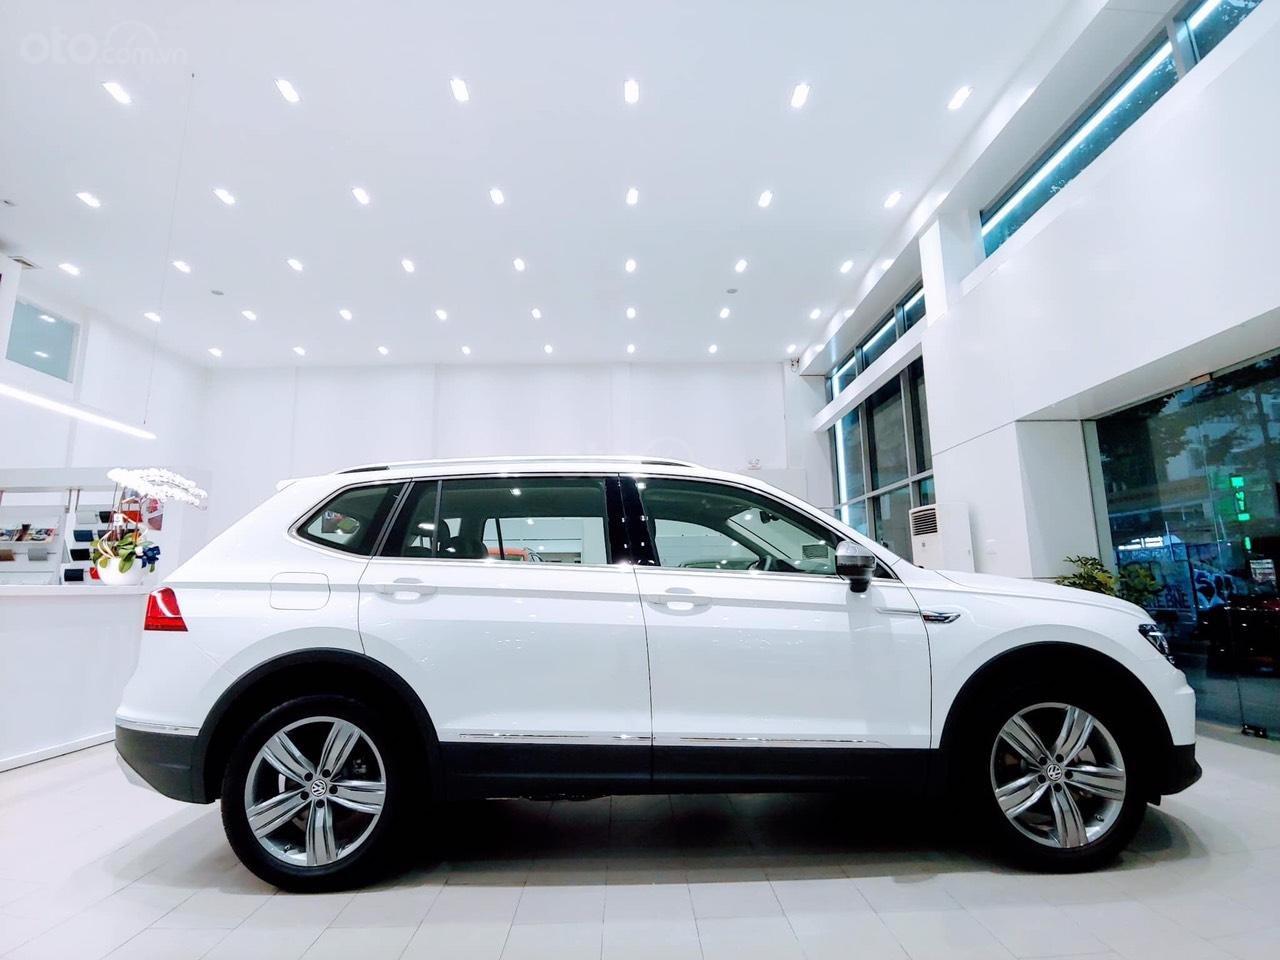 Bán Volkswagen Tiguan Allspace 2019, màu trắng-1